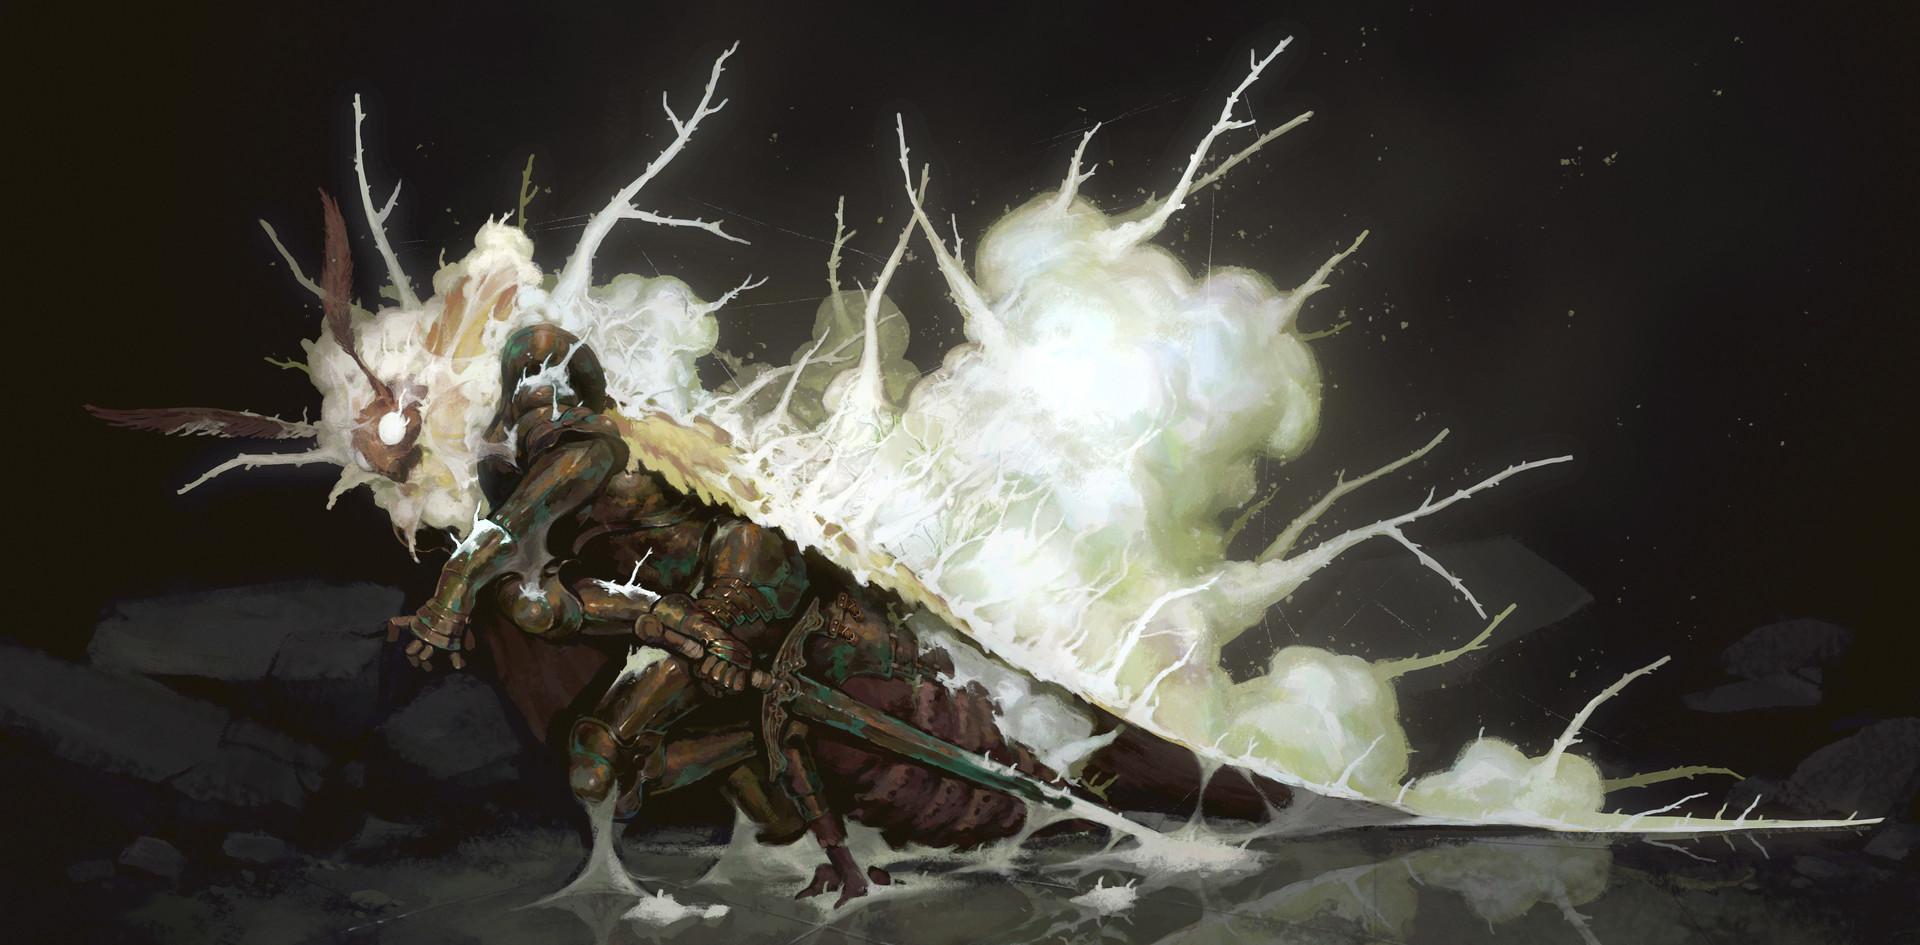 Vasco mariano insect warrior final jpeg